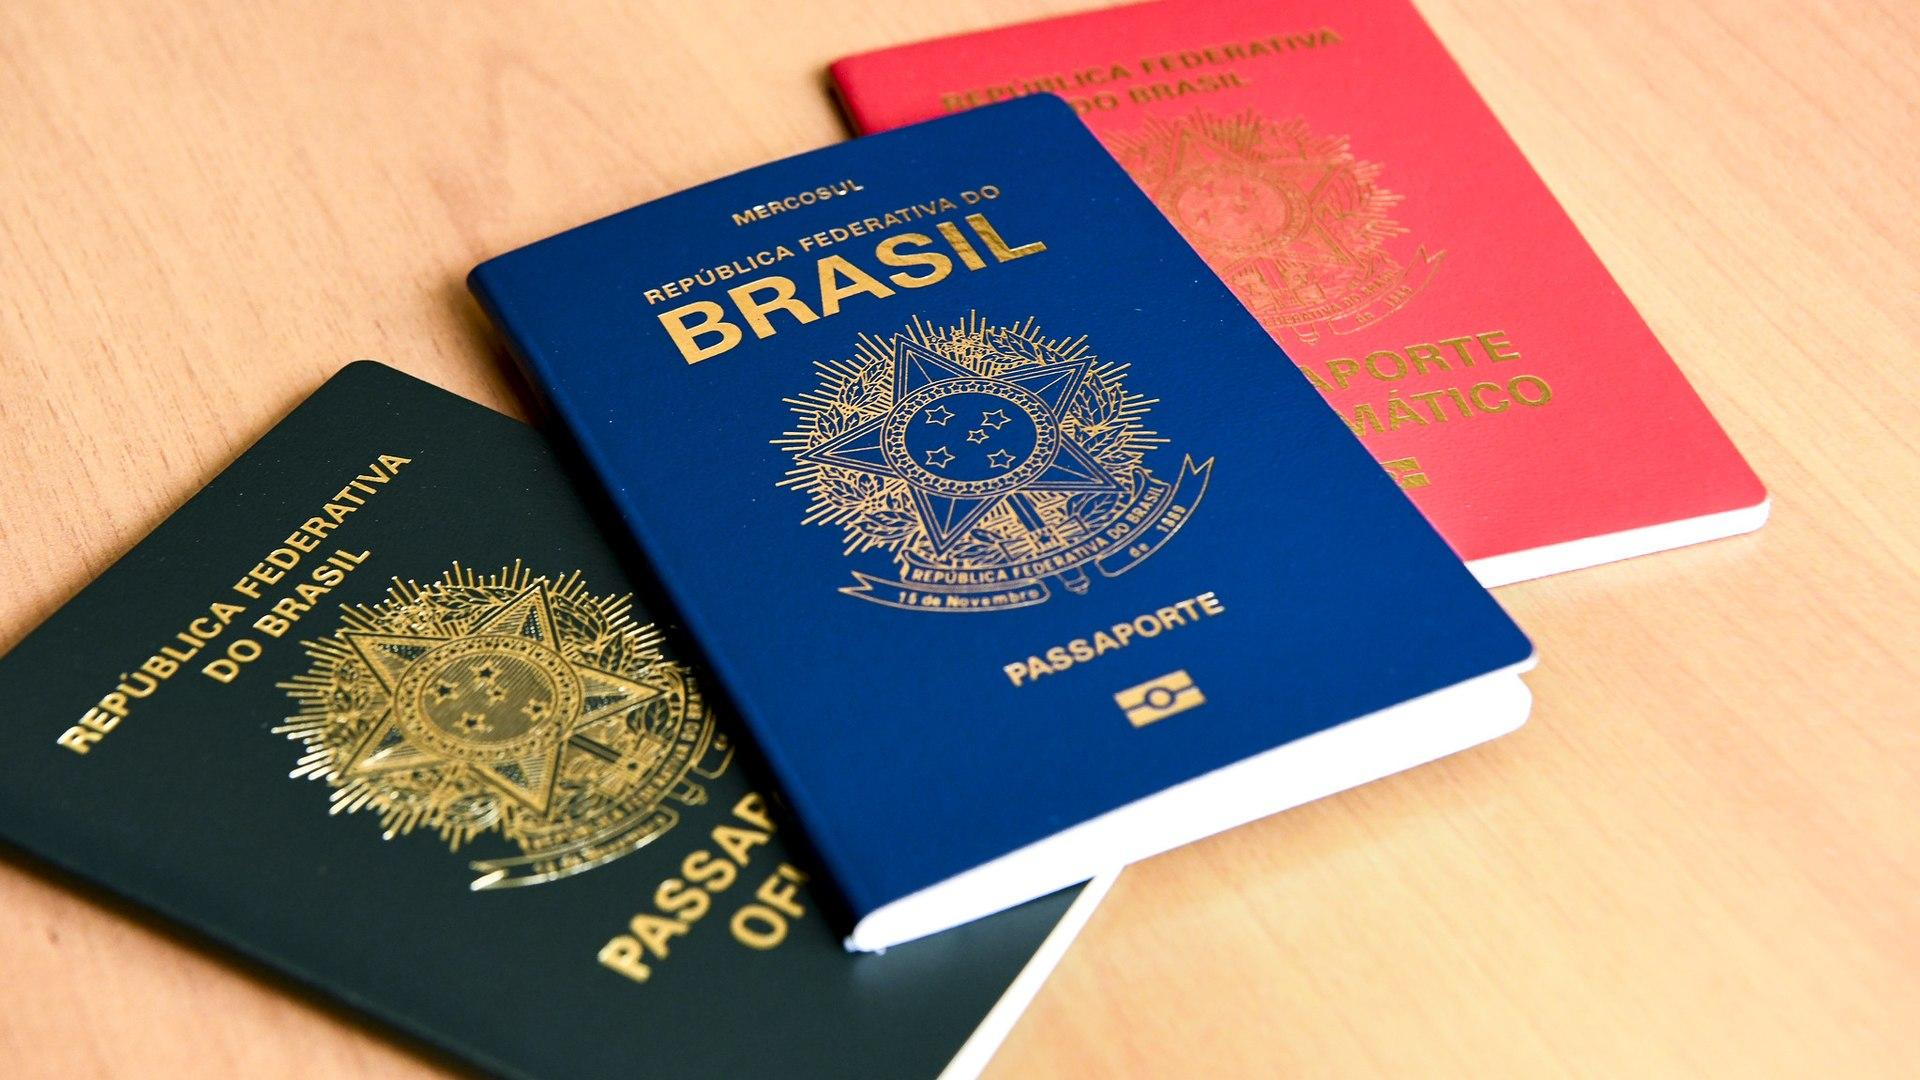 Passaporte com nome sujo